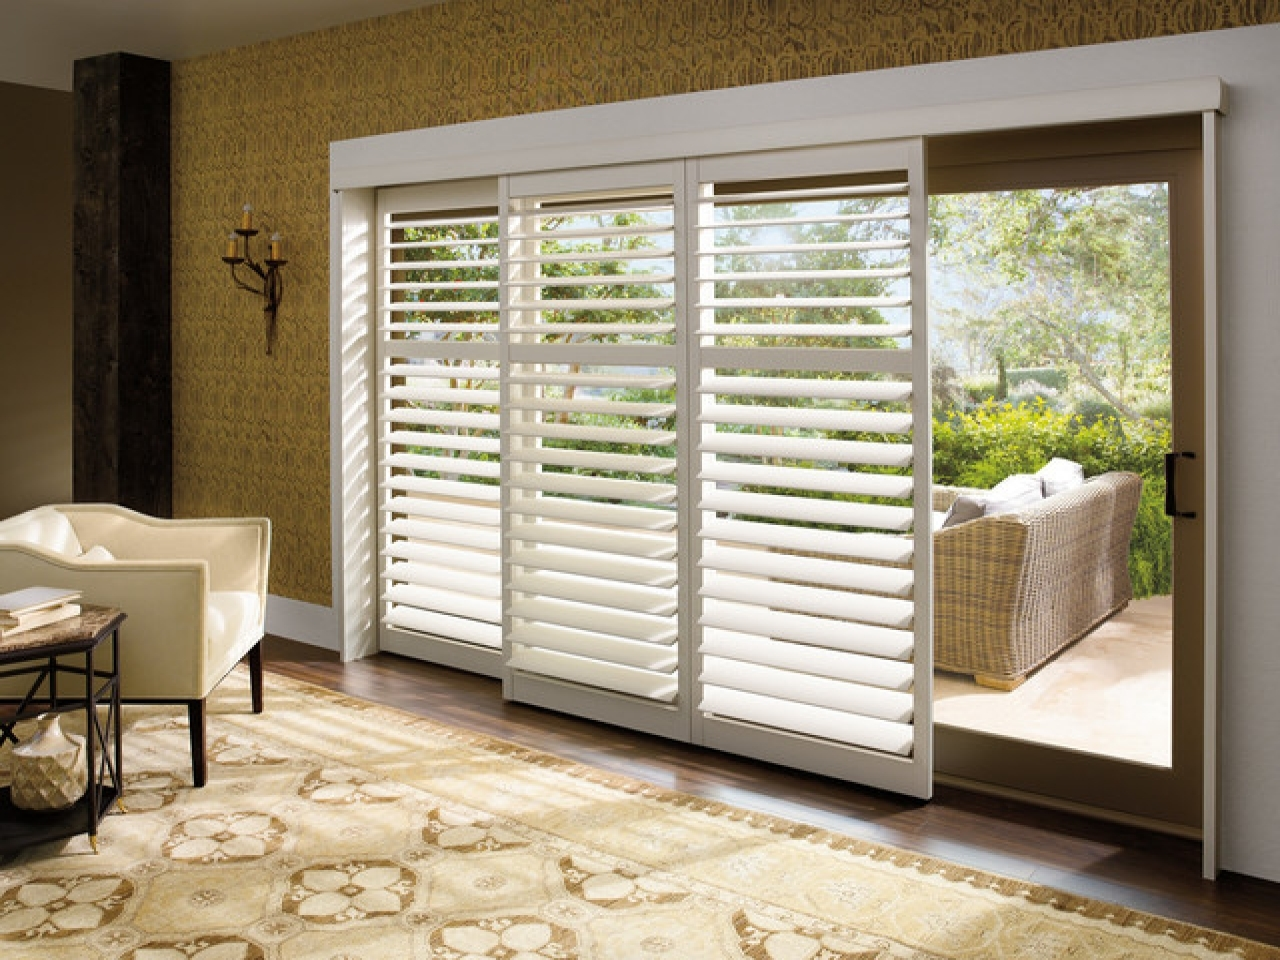 Panel Shades For Sliding Glass Doorswindow treatments for sliding glass doors ideas tips